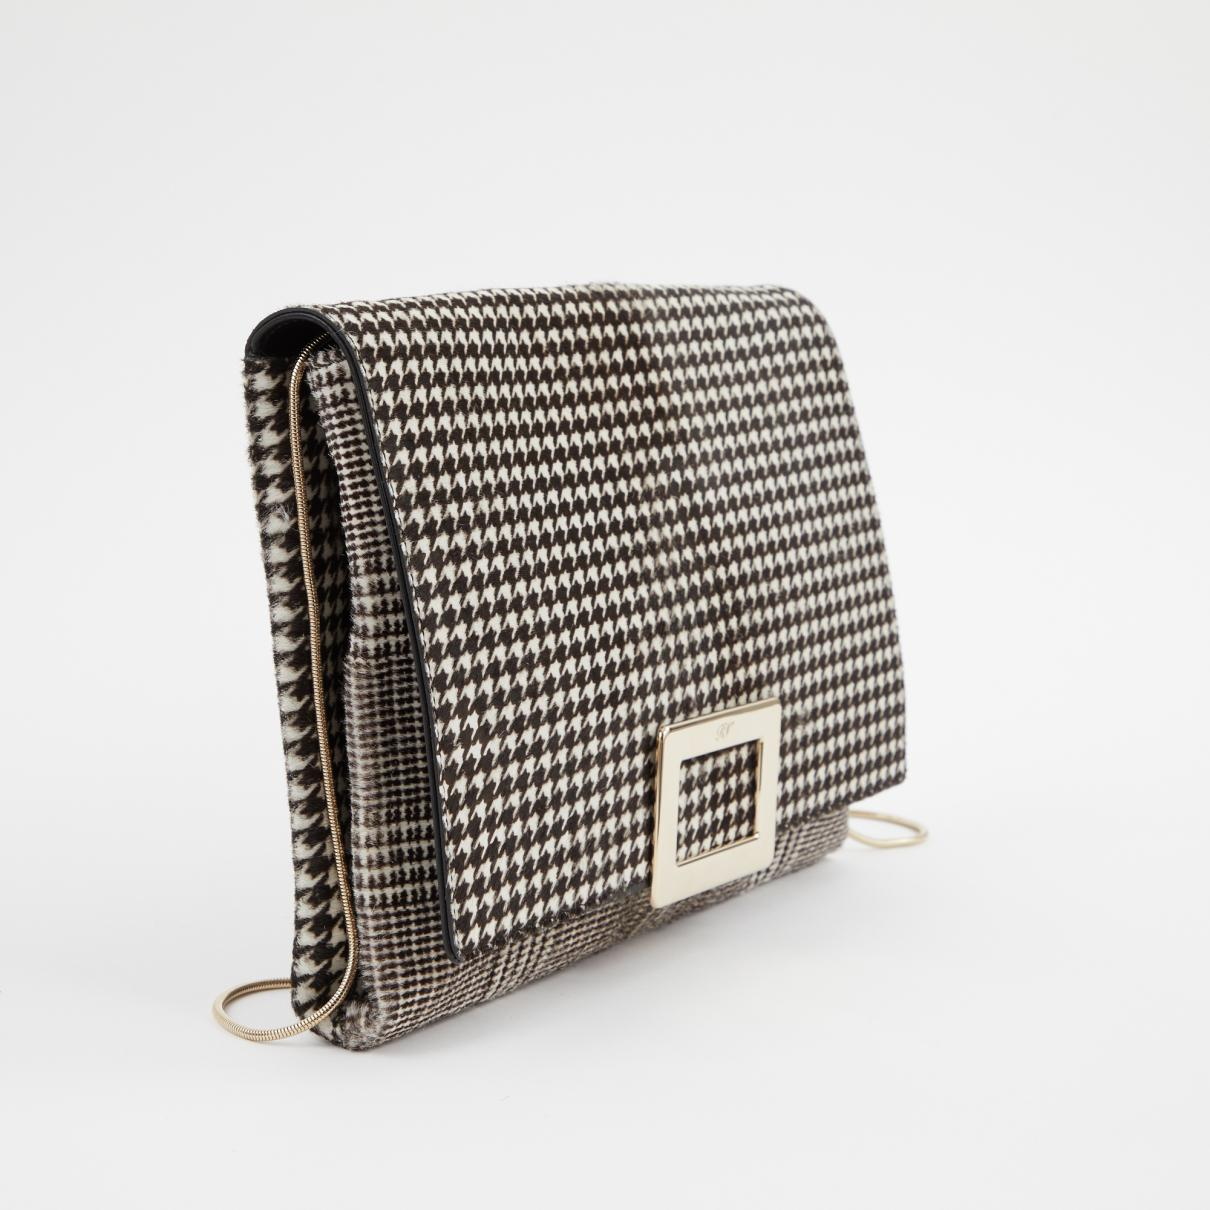 be11c2e60df2 Roger Vivier Pony-style Calfskin Clutch Bag in Black - Lyst